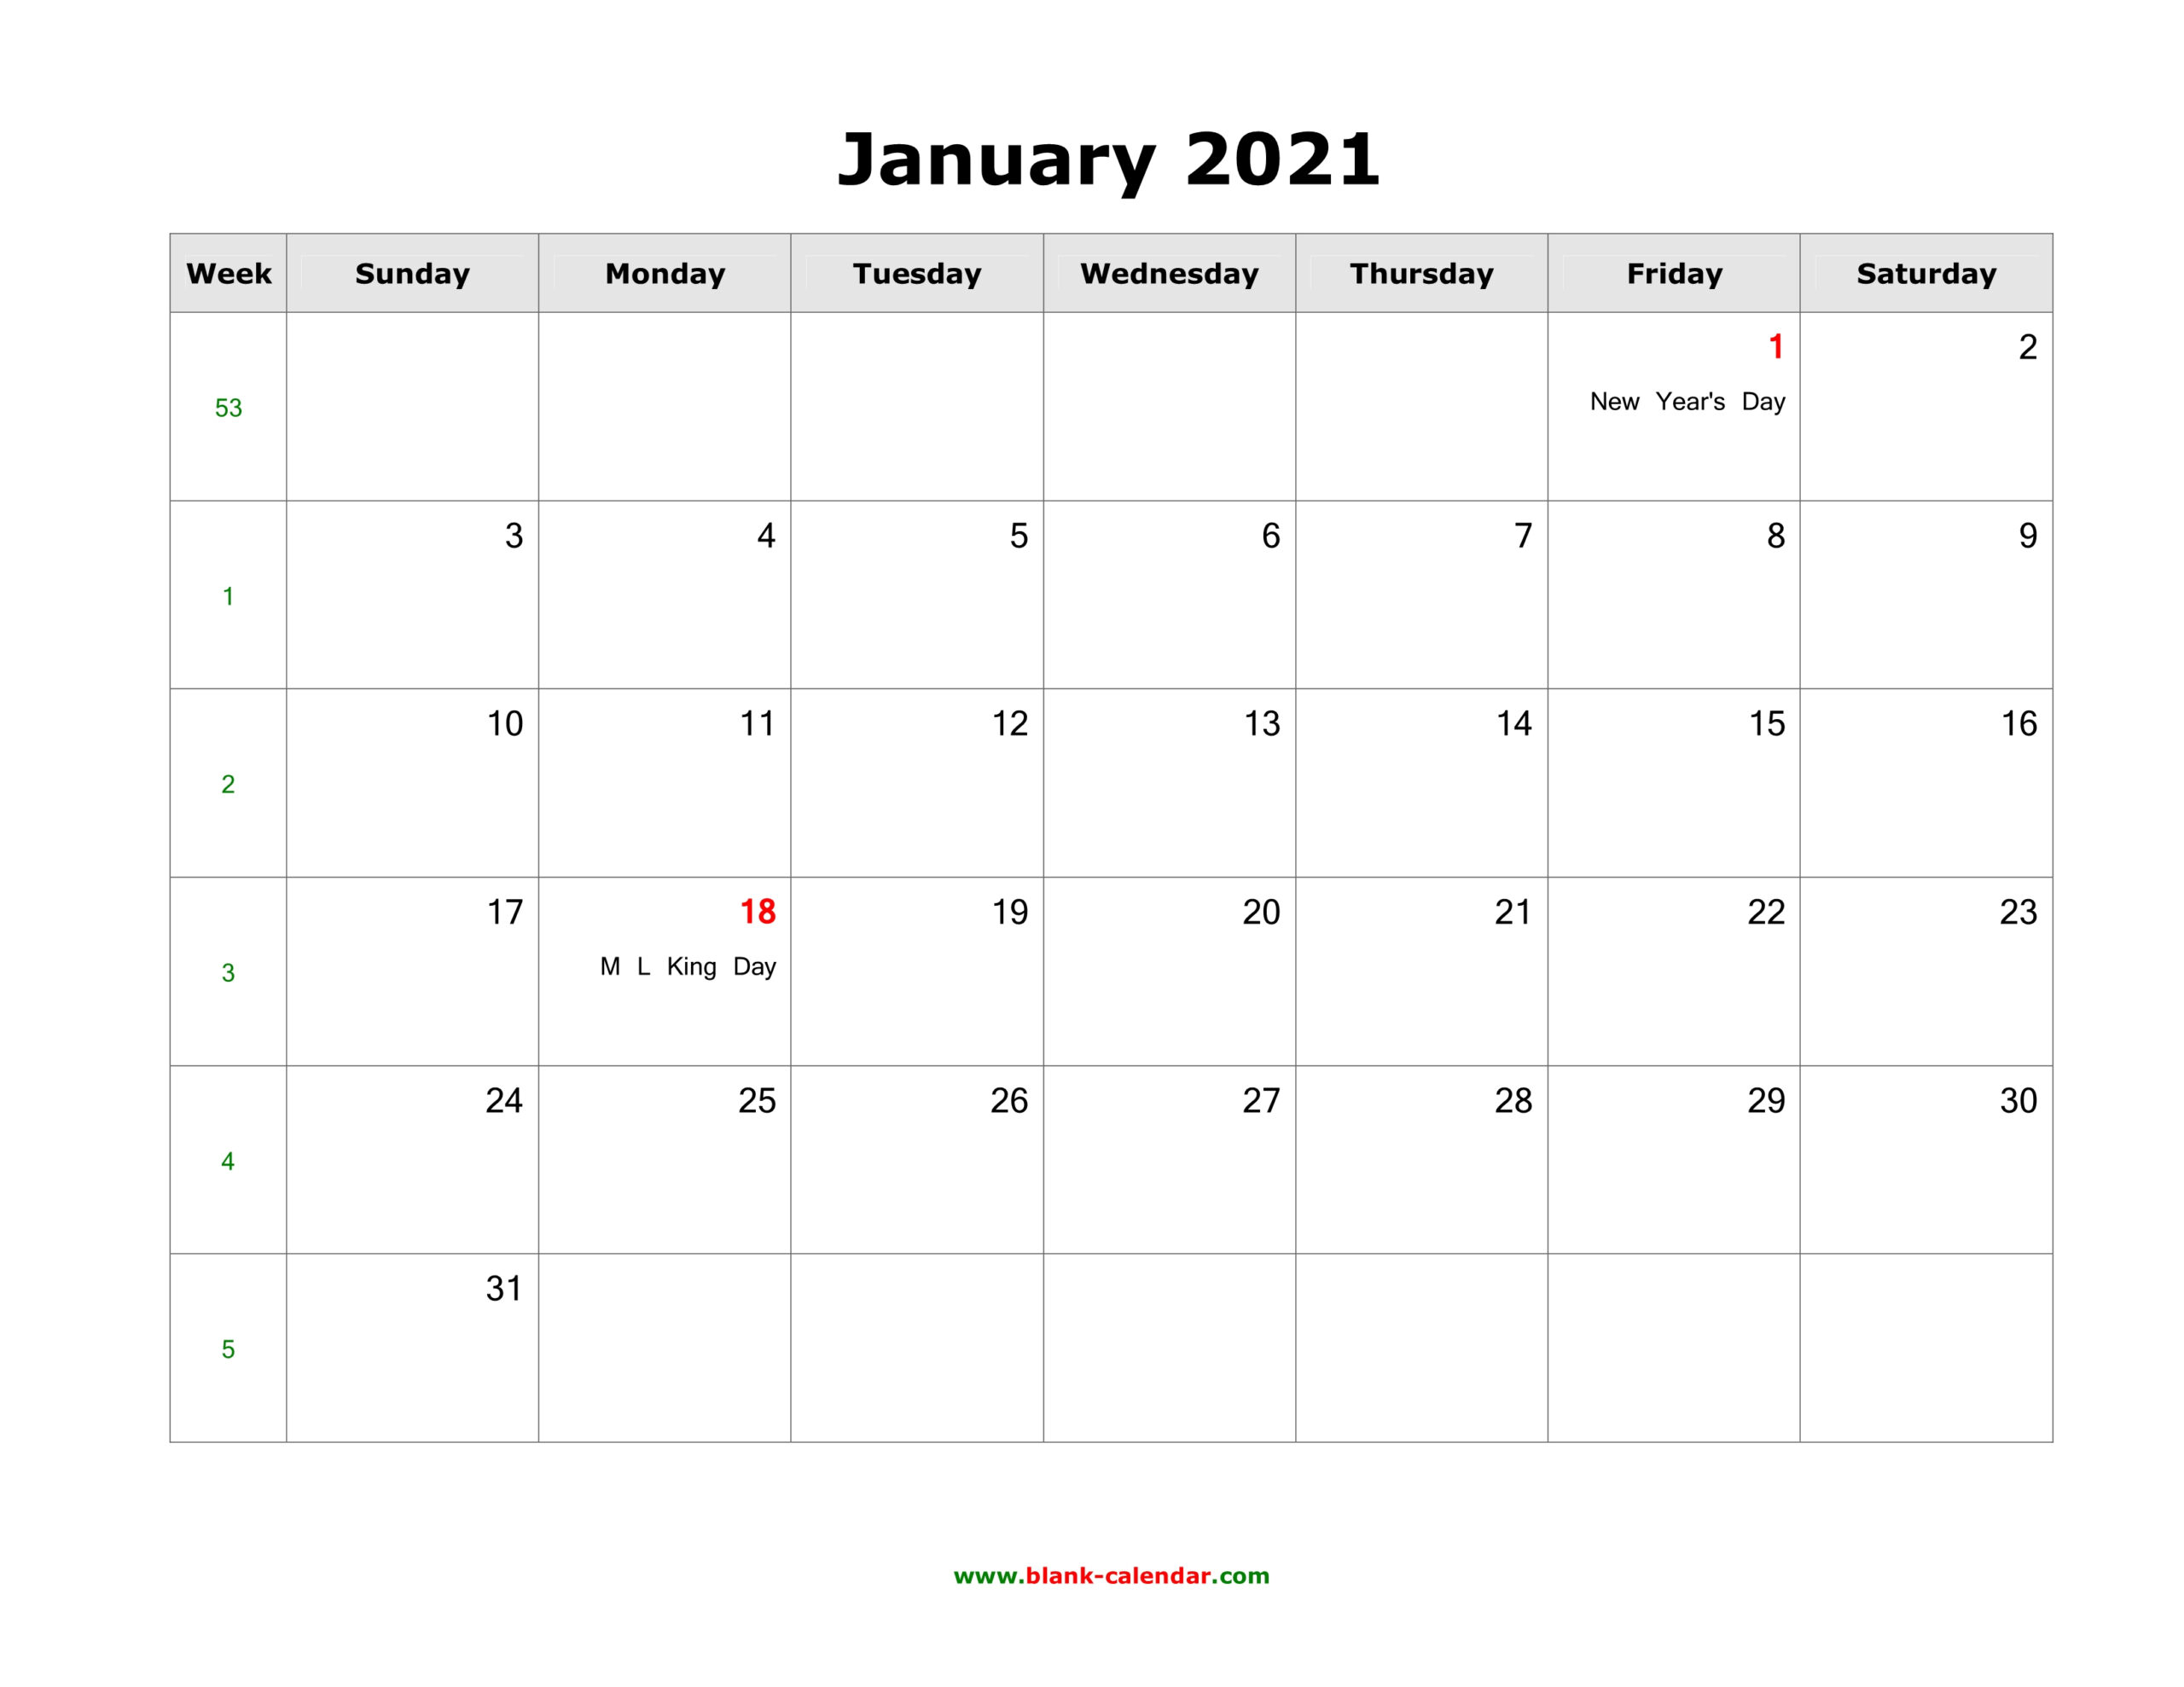 January 2021 Blank Calendar | Free Download Calendar Templates throughout 2021 Fillable Calendar Free Printable